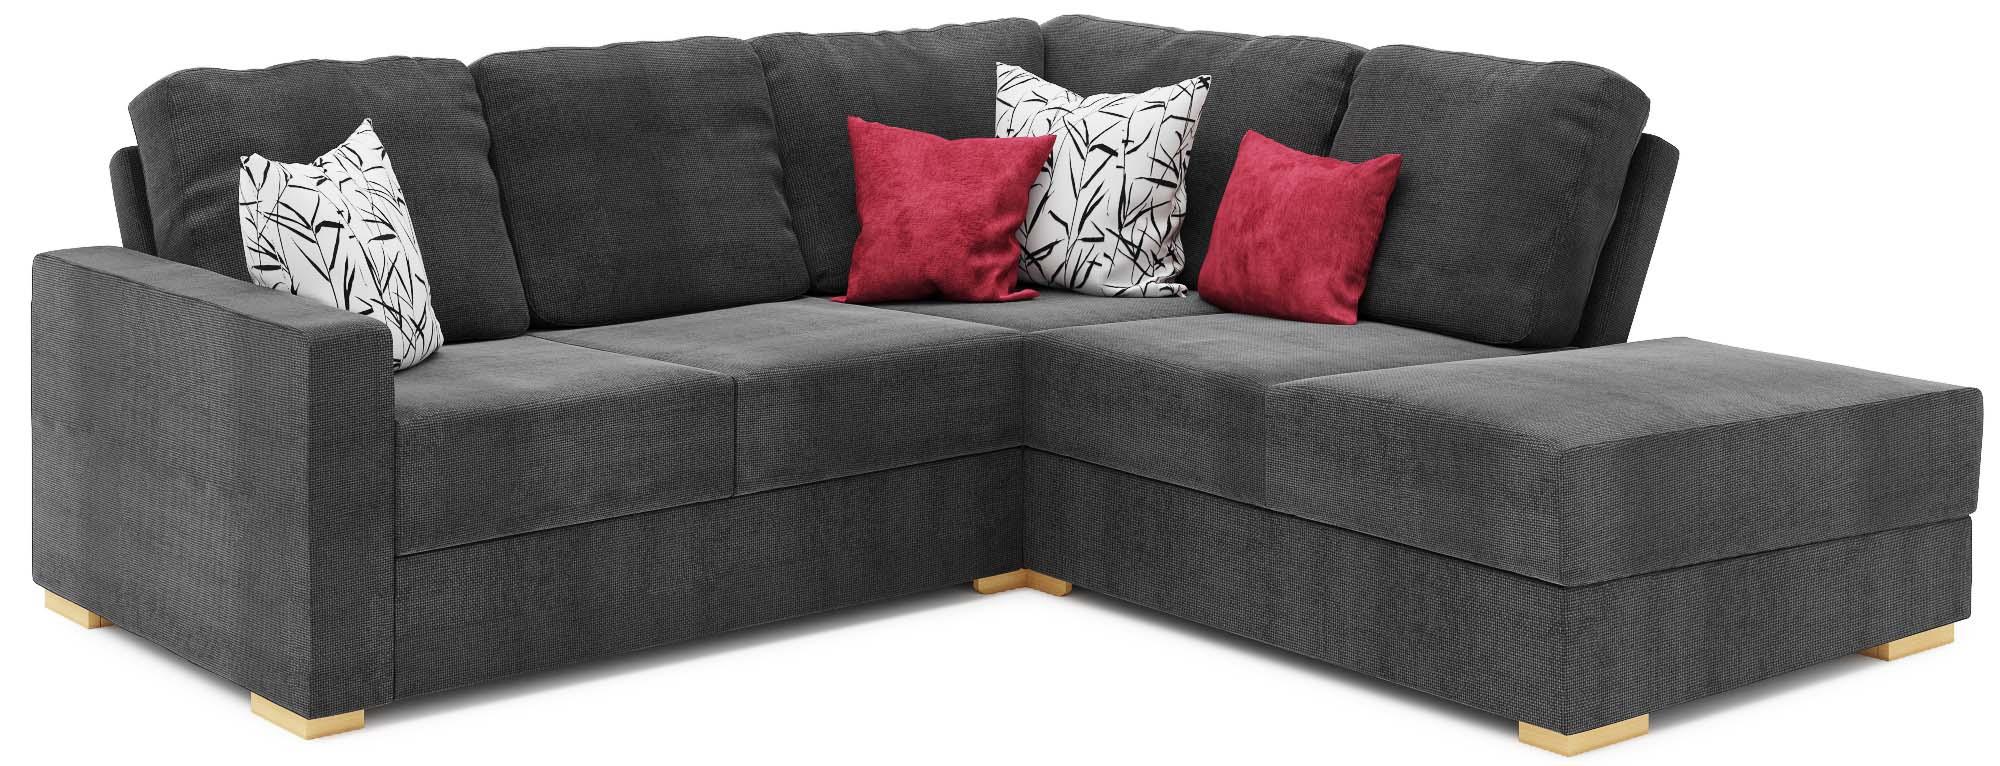 Lear Chaise 3x3 Corner Corner Chaise Sofa Nabru